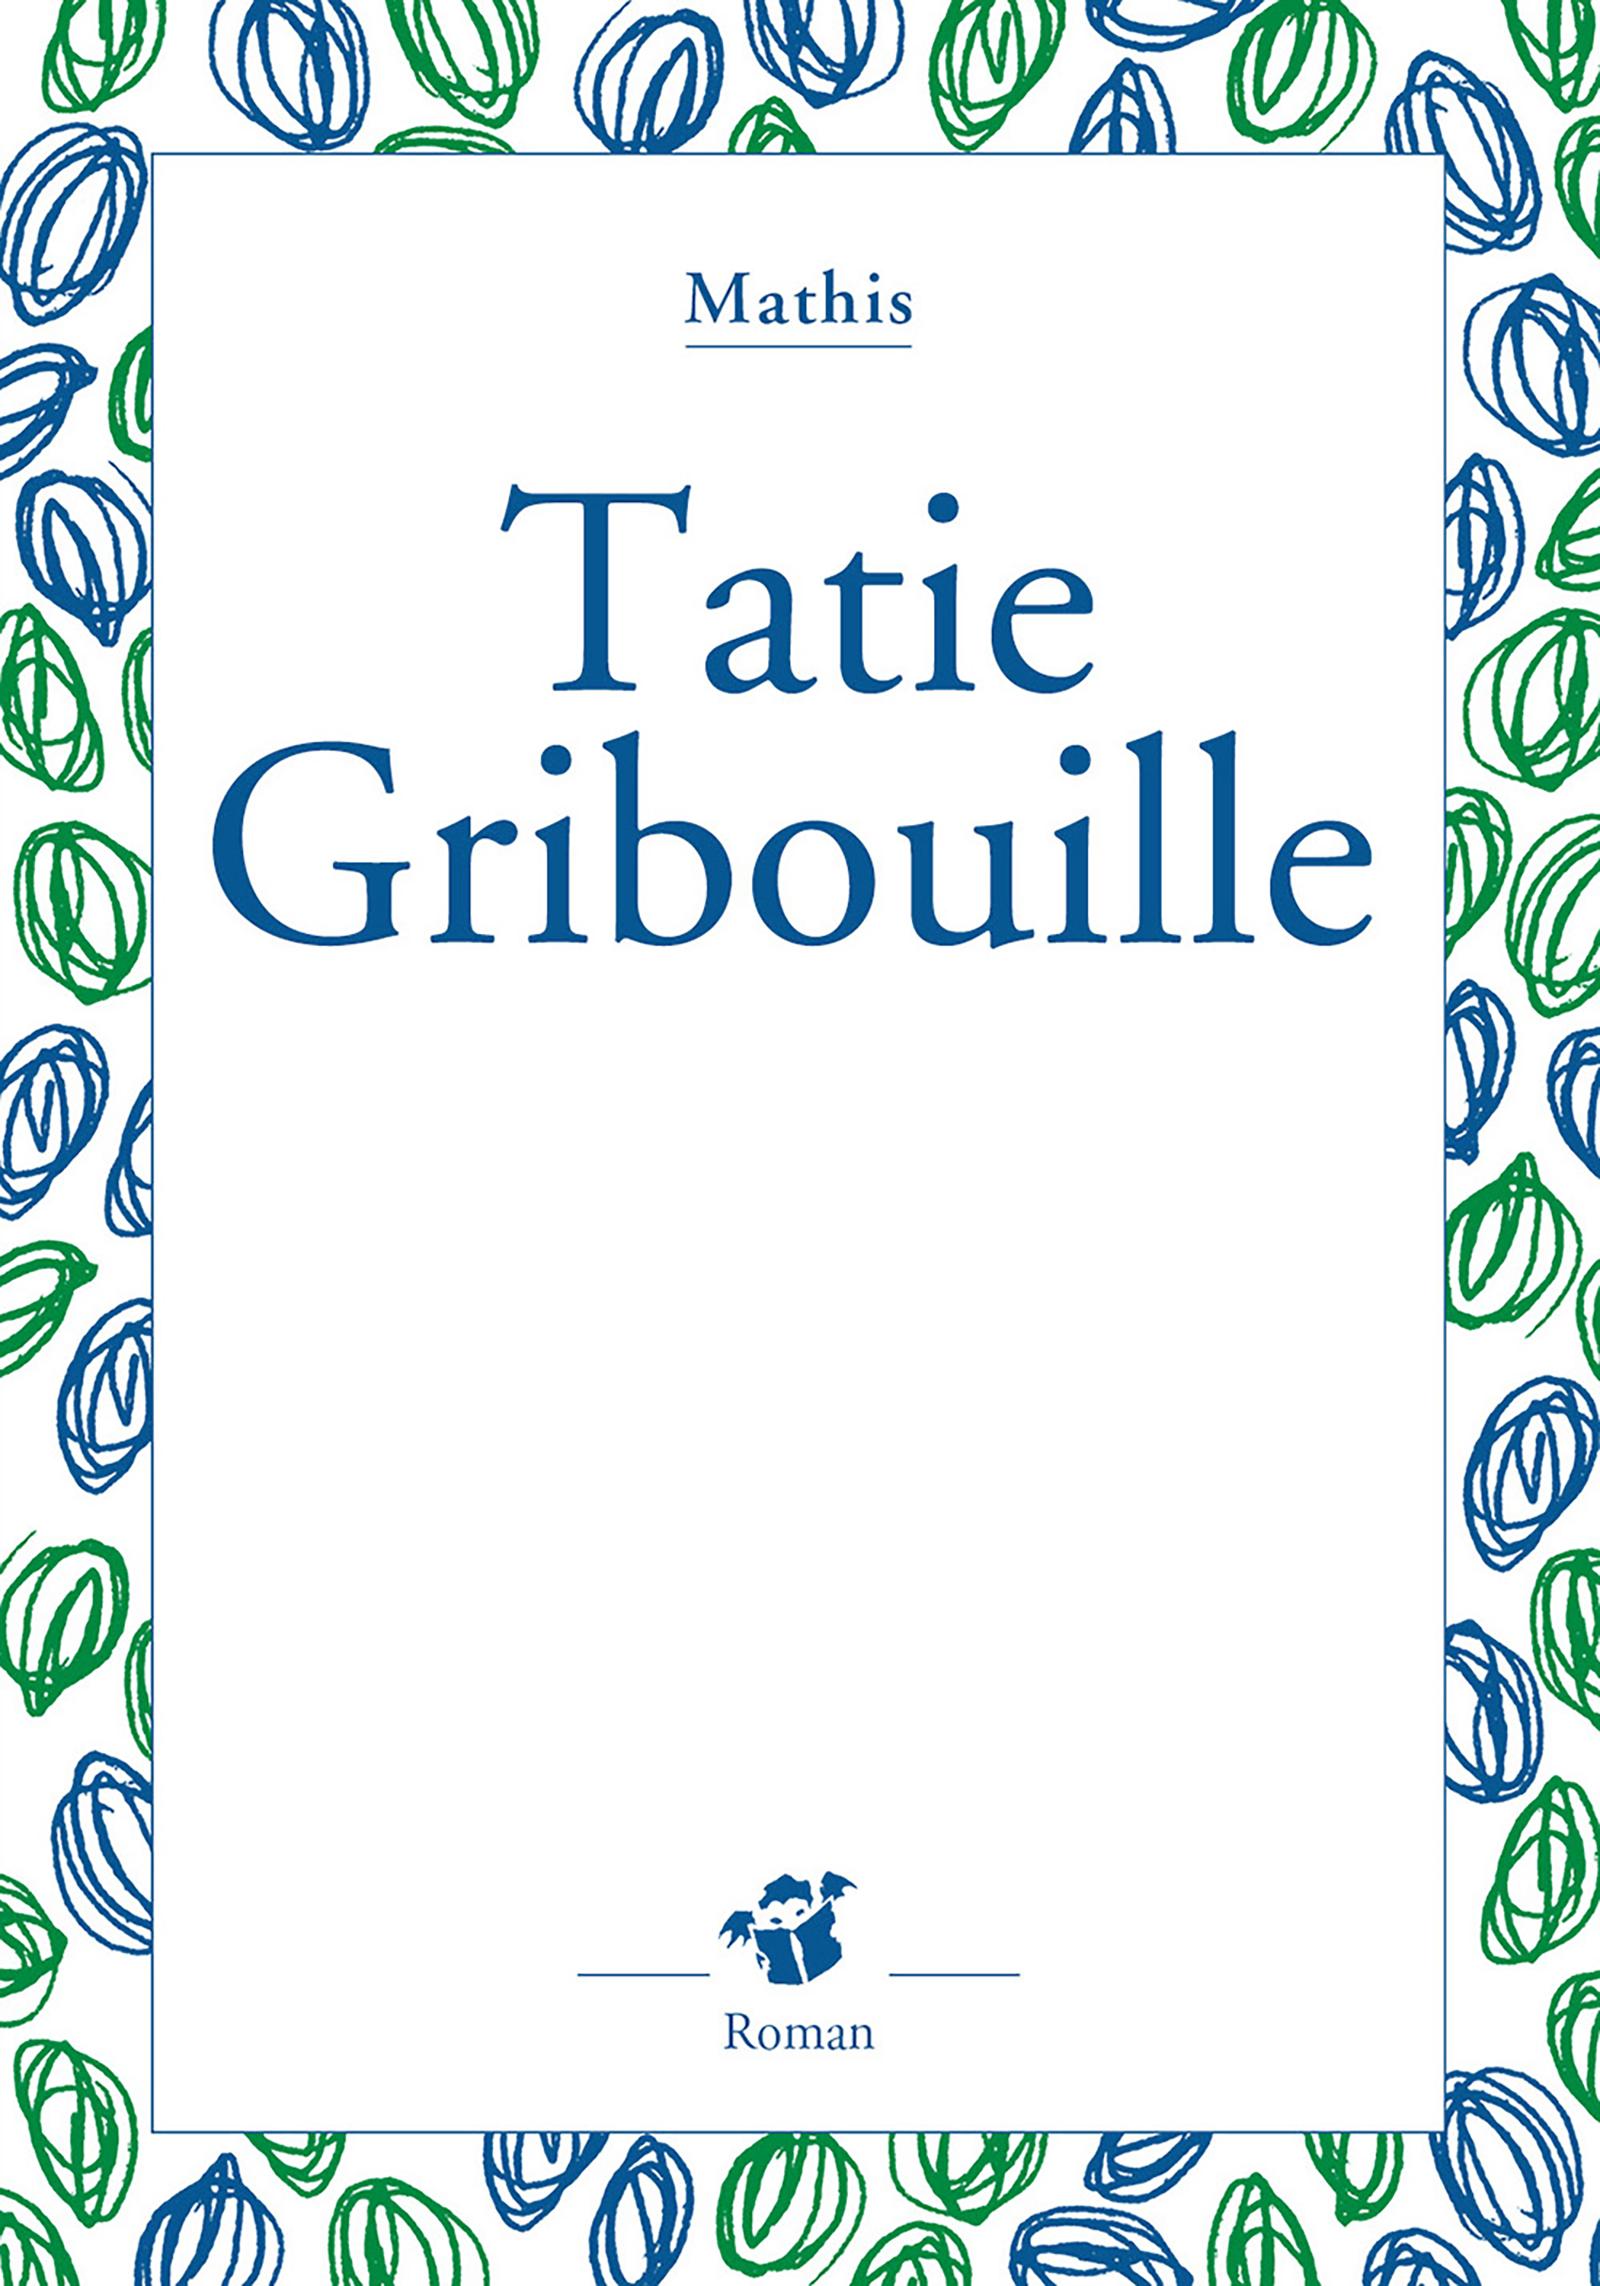 Tatie Gribouille